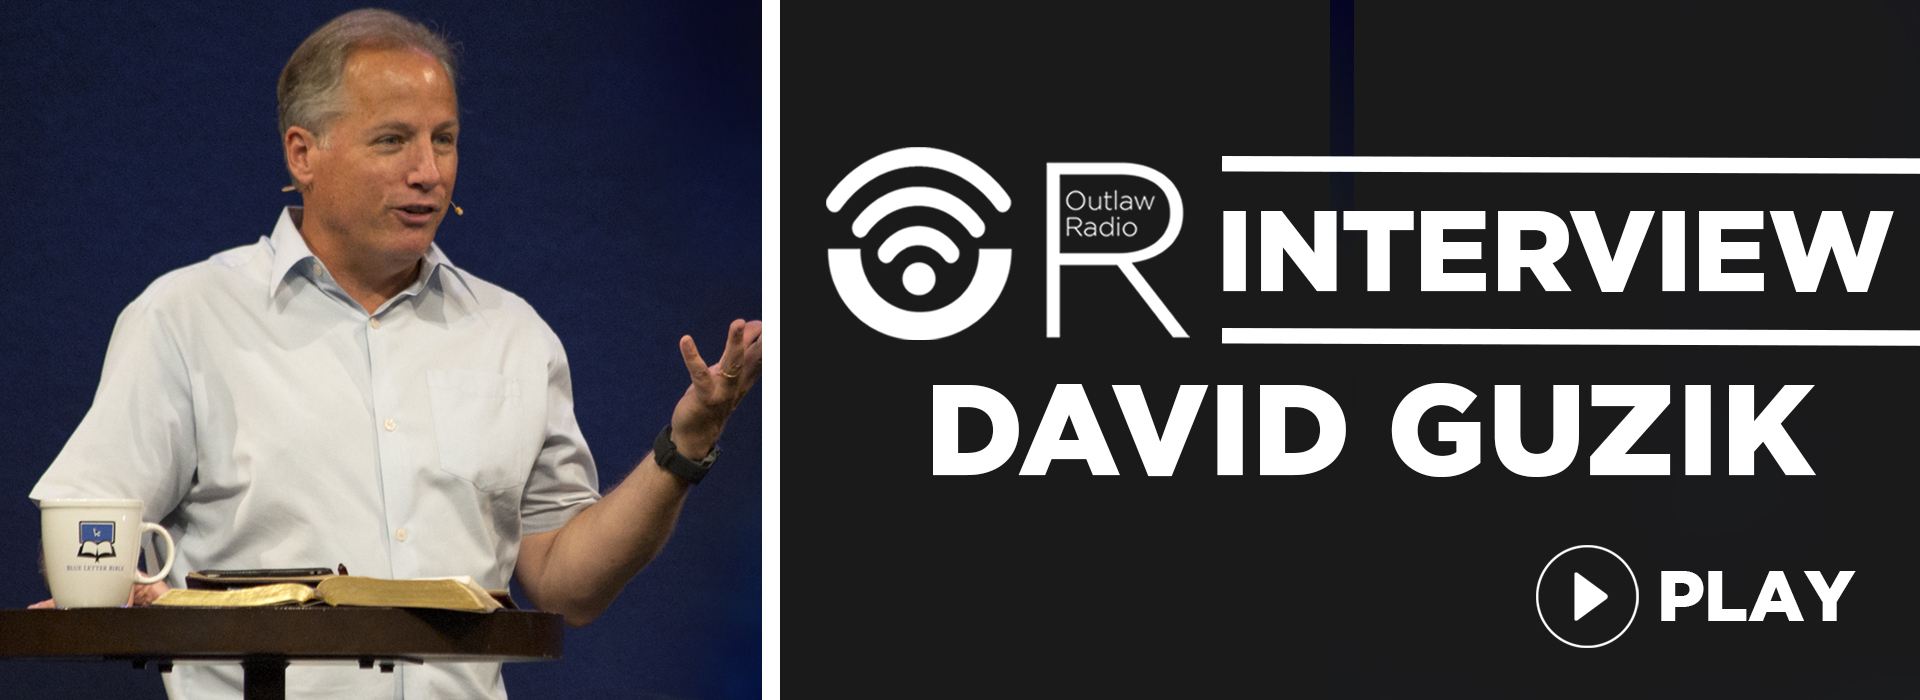 david-guzik